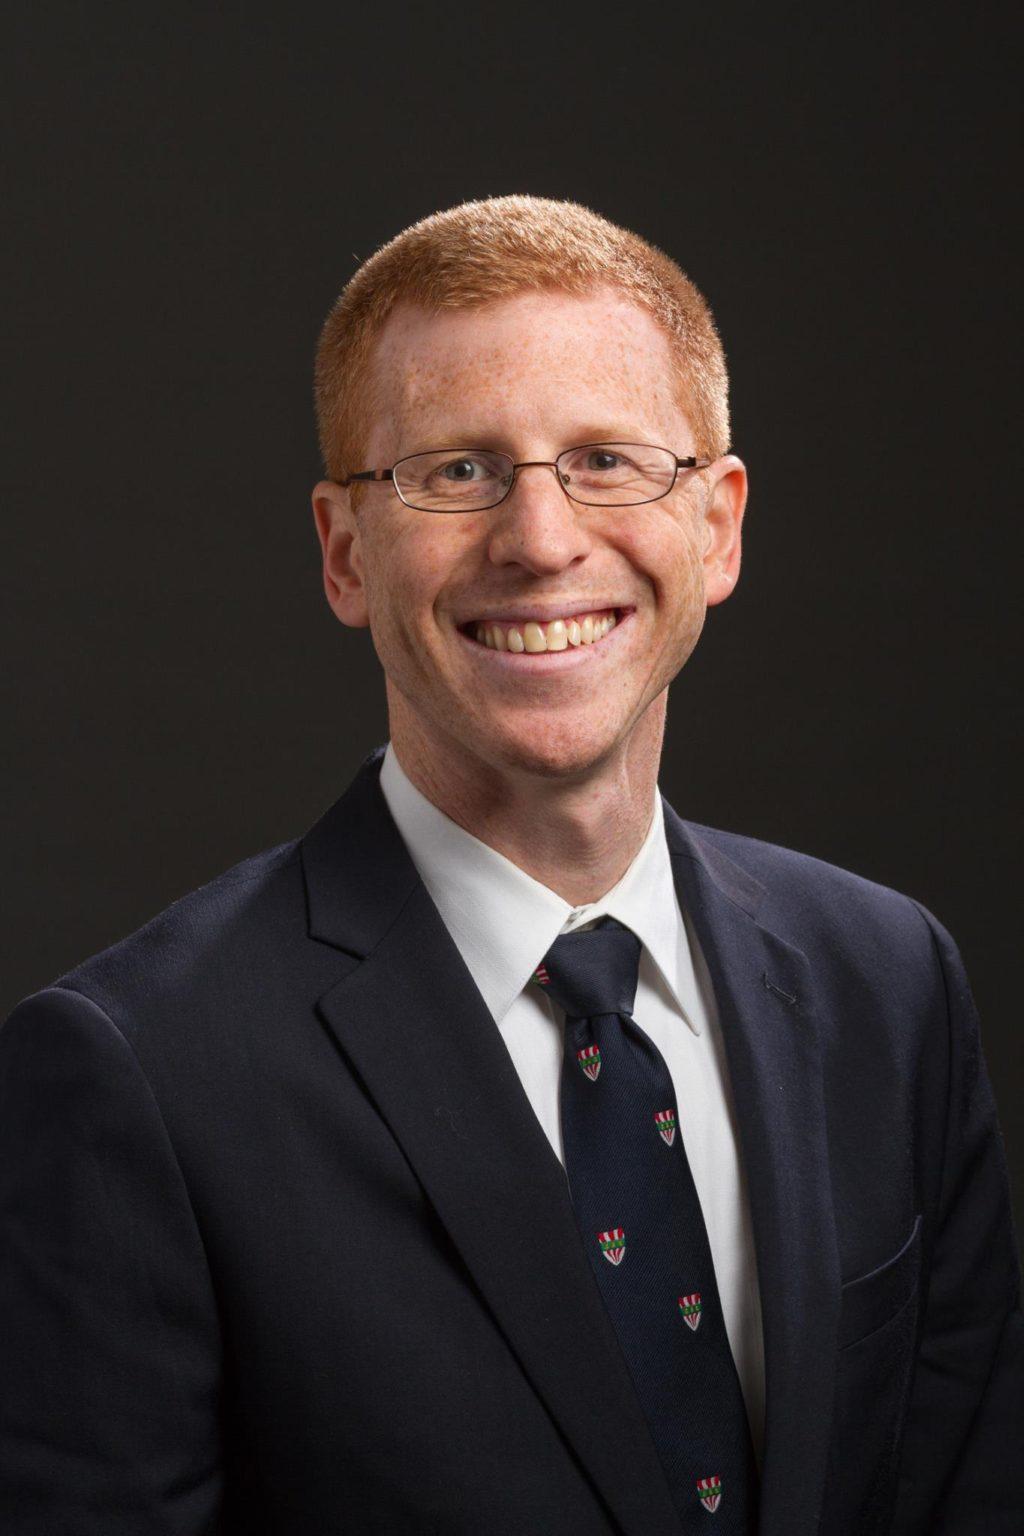 Samuel Katz MD PhD